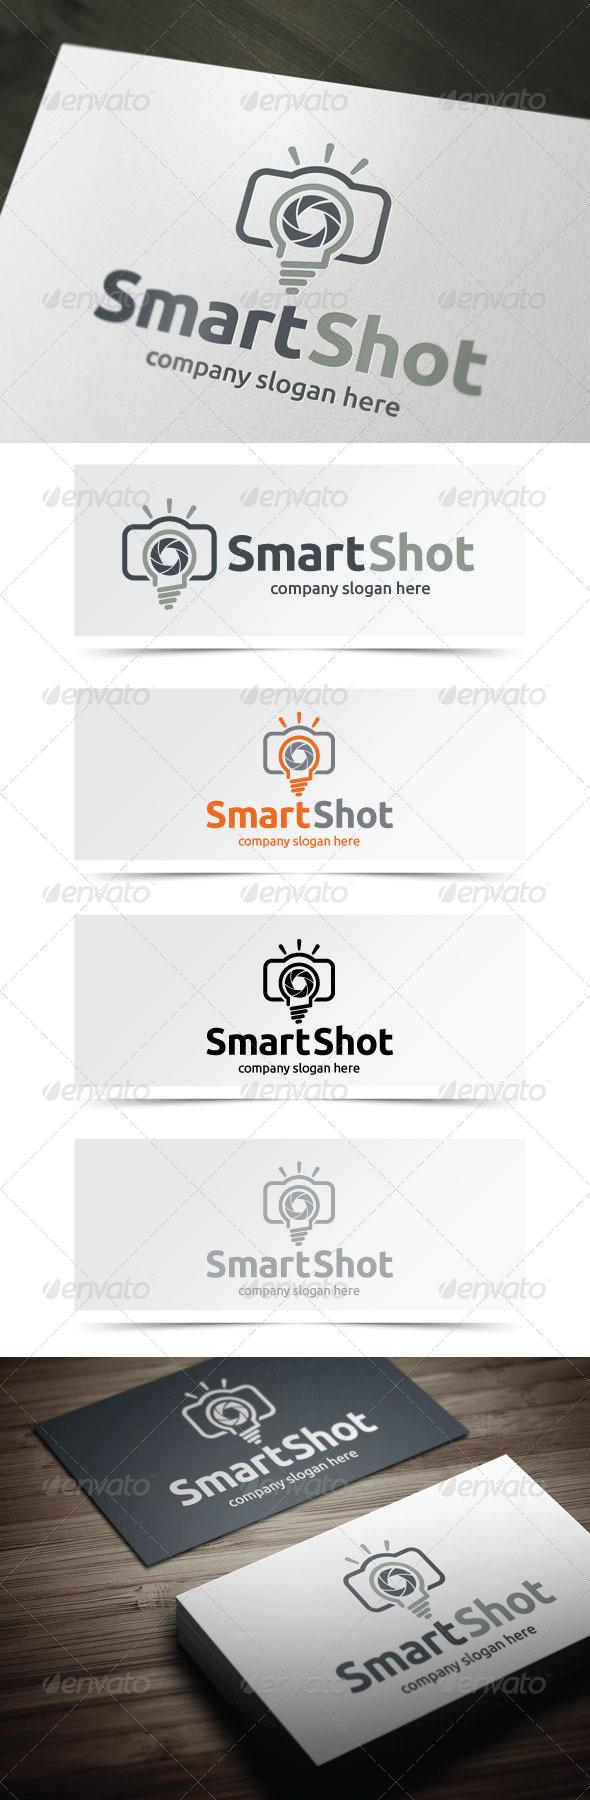 GraphicRiver Smart Shot 5336446